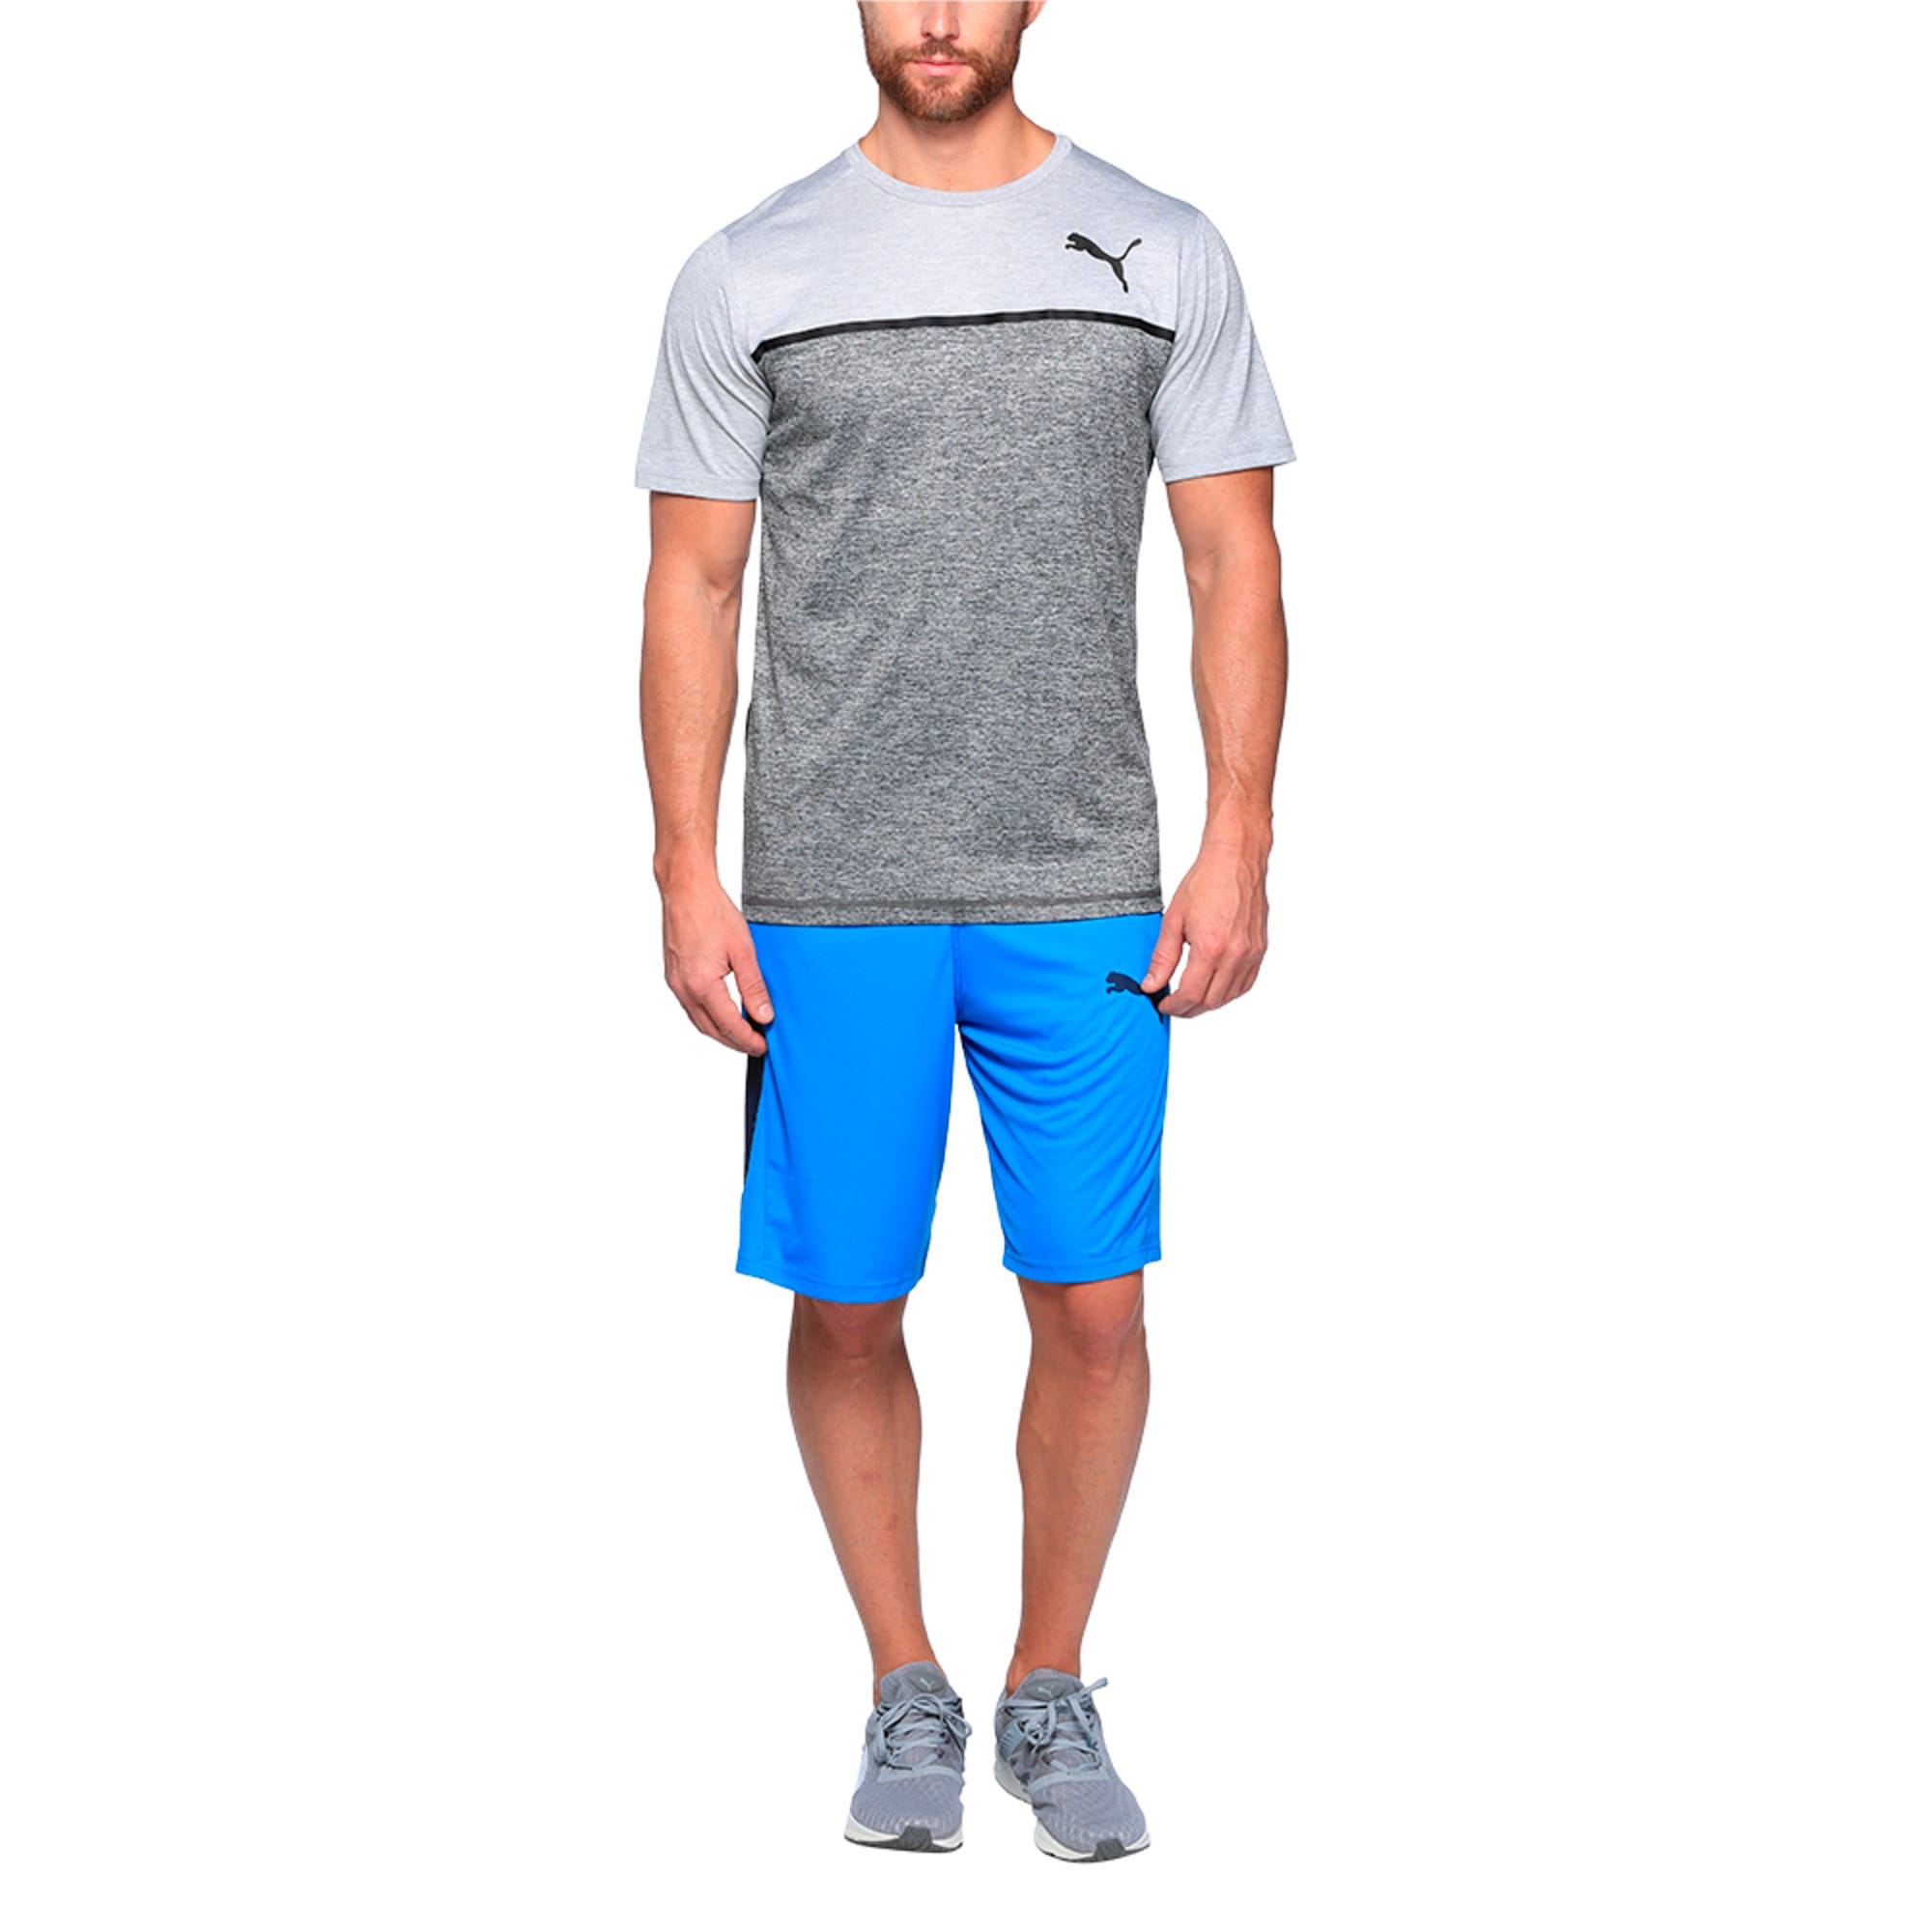 Thumbnail 2 of Active Training Men's Bonded Tech T-Shirt, Light GrayHthr-Dark GrayHthr, medium-IND